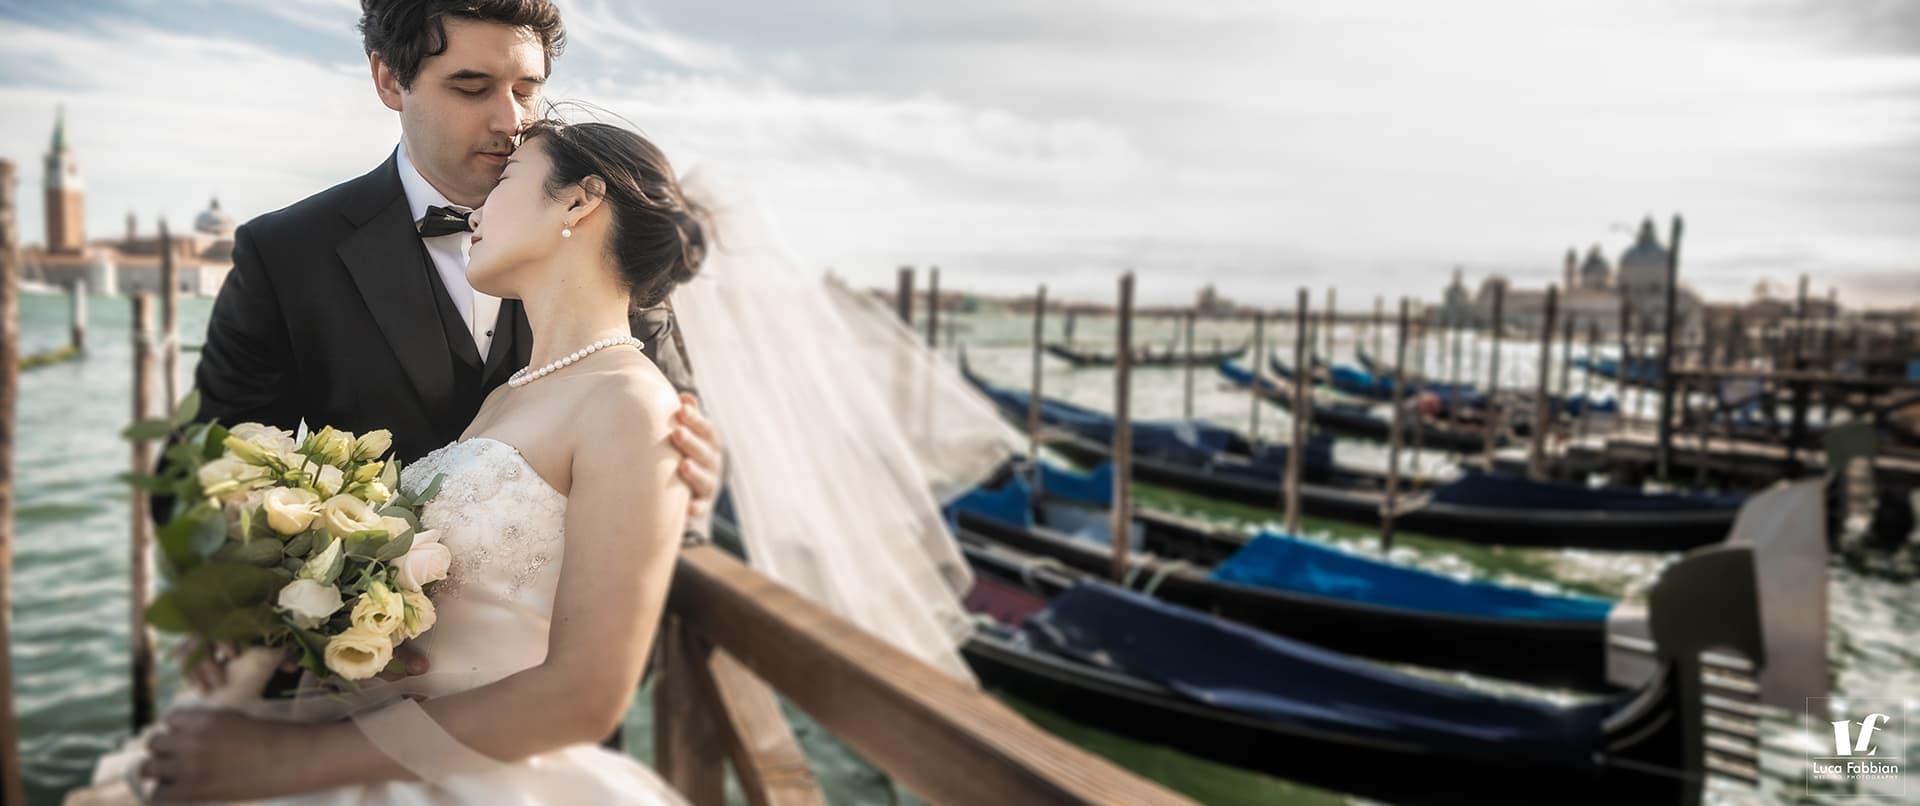 Wedding photo shoot in Venice Italy